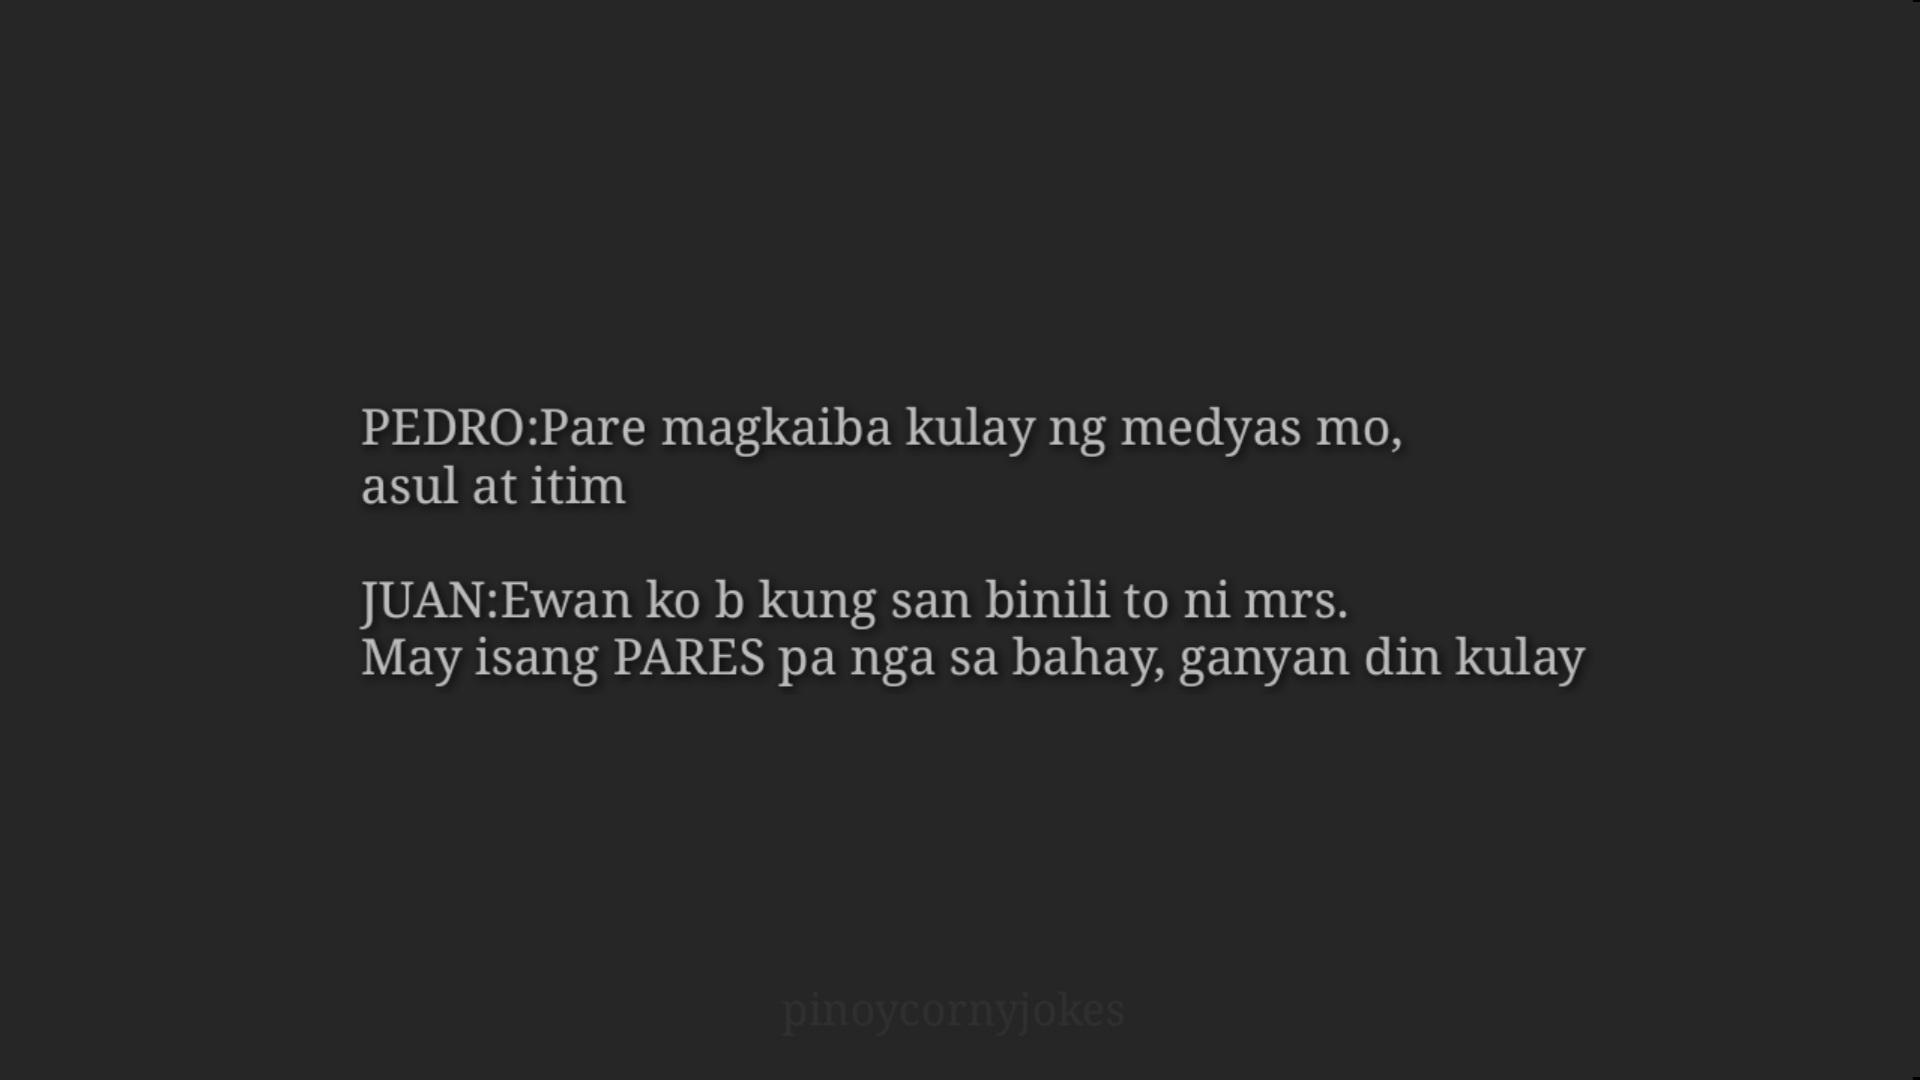 Magkaiba kulay Medyas - Filipino Jokes 2021